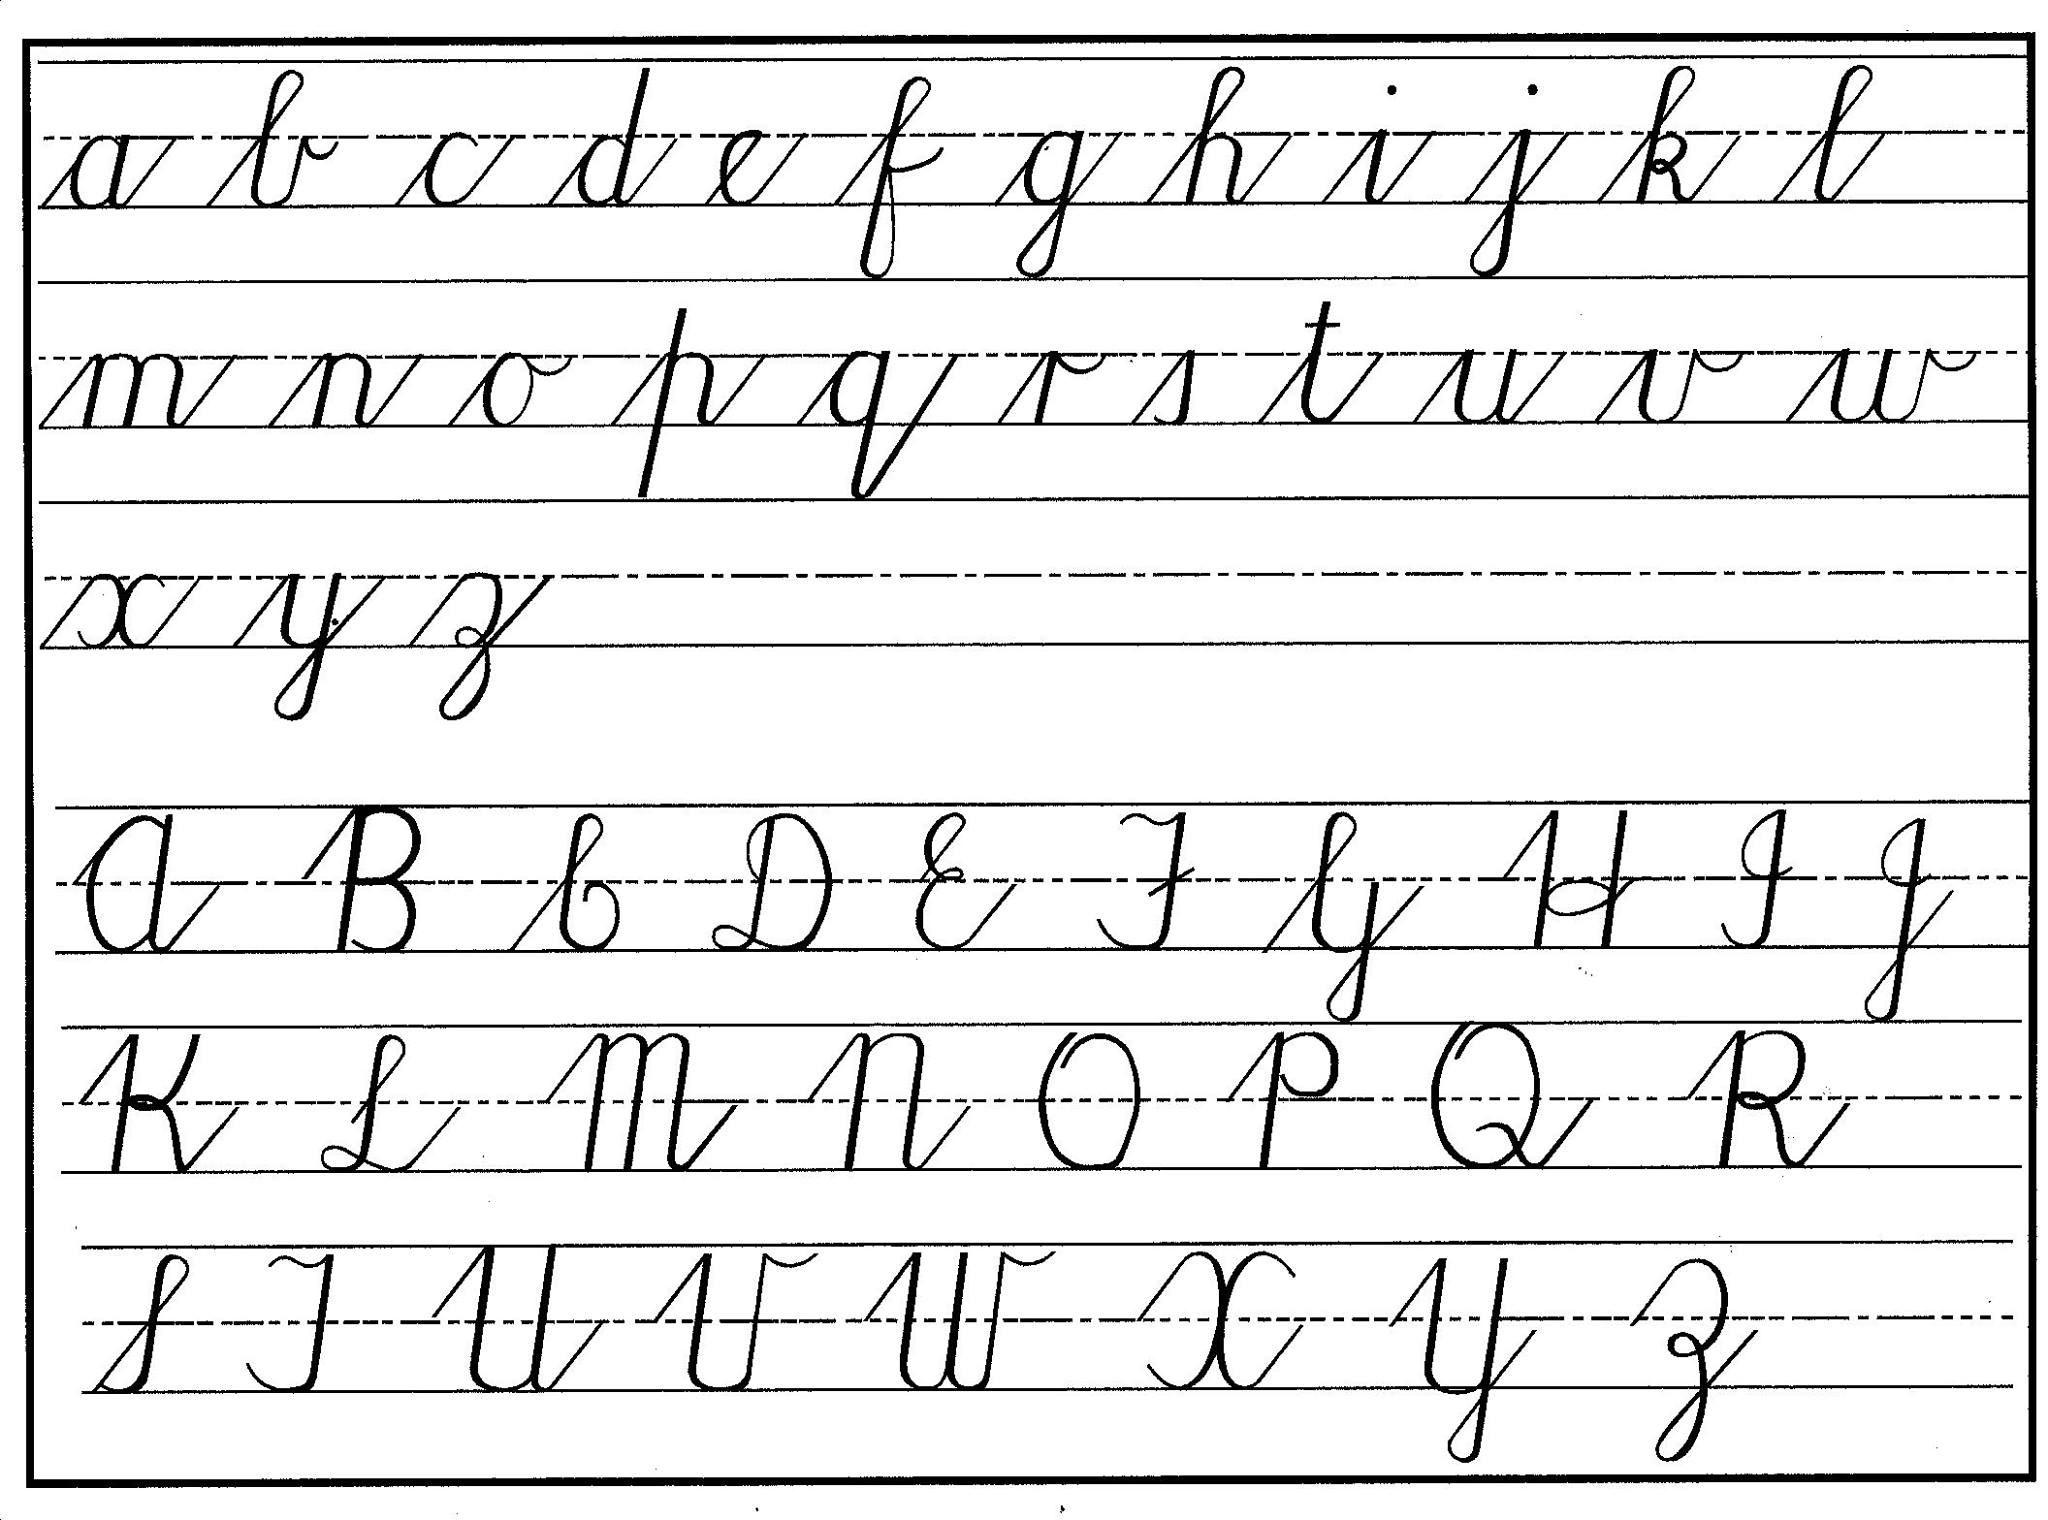 Pin By Lowell Swan On Useless Knowledge Teaching Cursive Cursive Handwriting Worksheets Cursive Writing Worksheets [ 1520 x 2048 Pixel ]